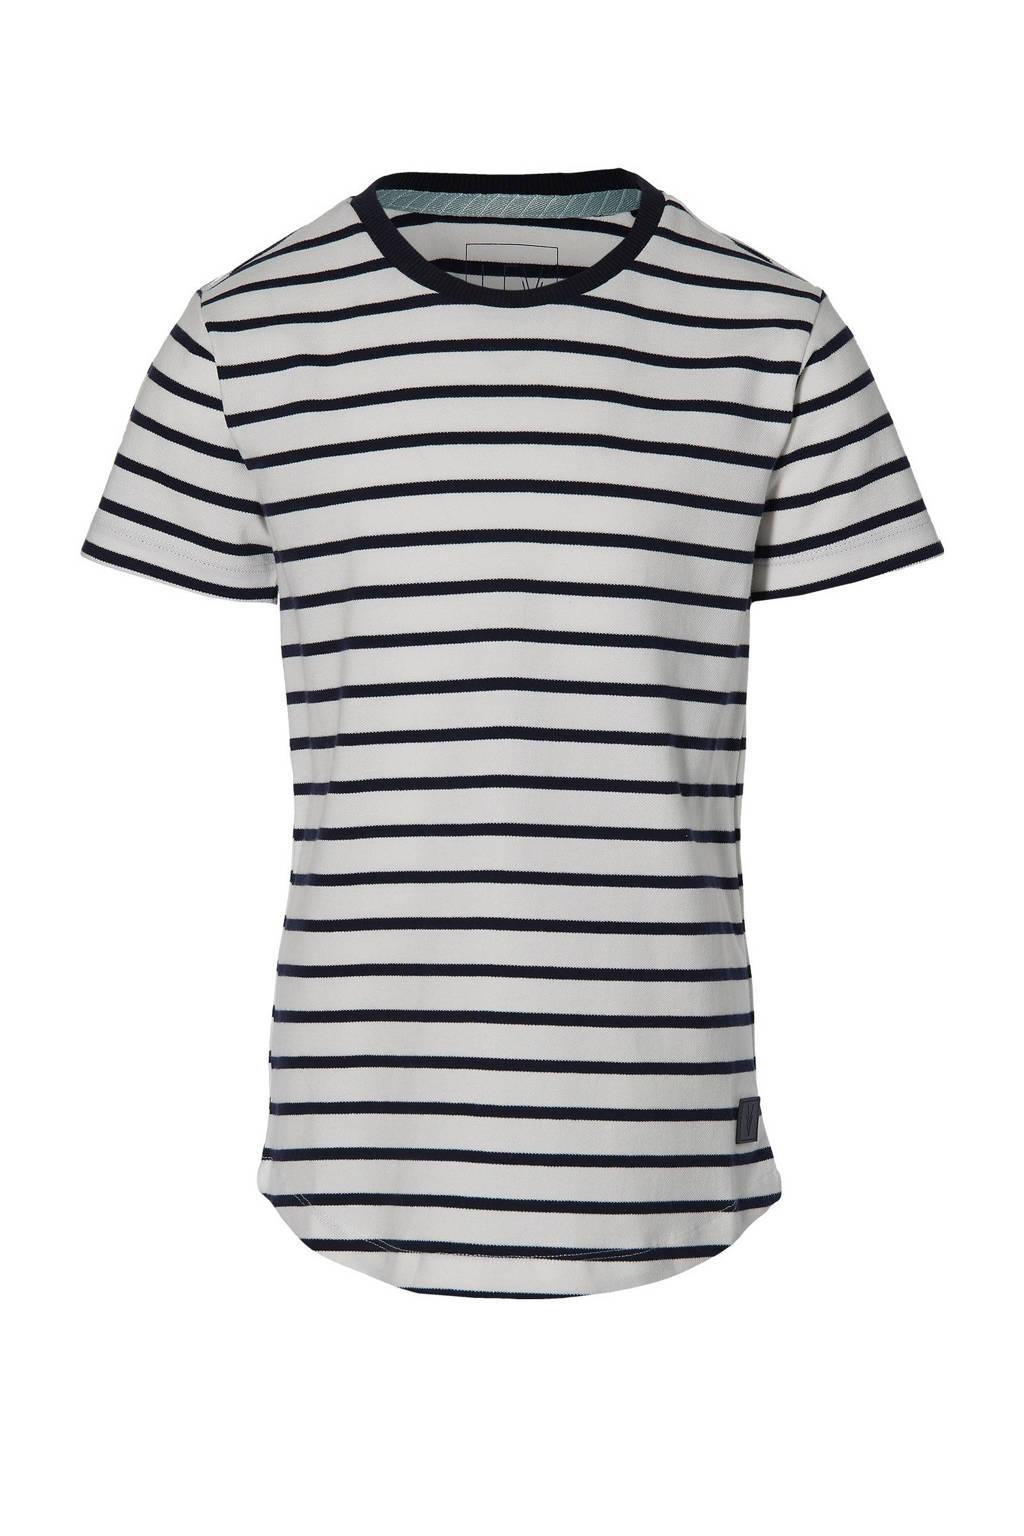 LEVV Boys gestreept T-shirt Mats donkerblauw/off white, Donkerblauw/off white